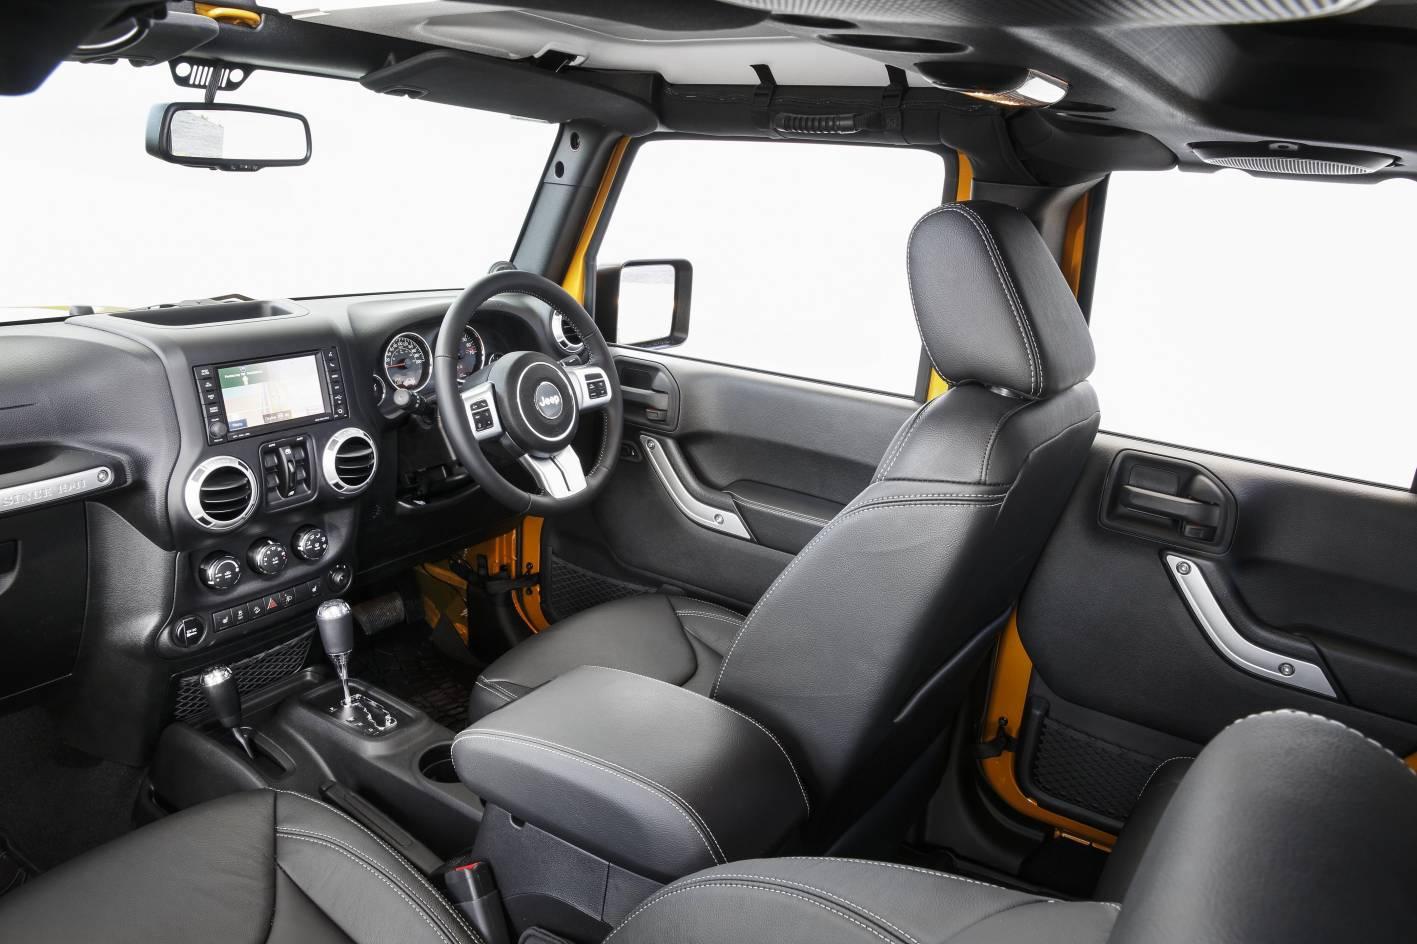 2014 Jeep Wrangler Rubicon X Interior